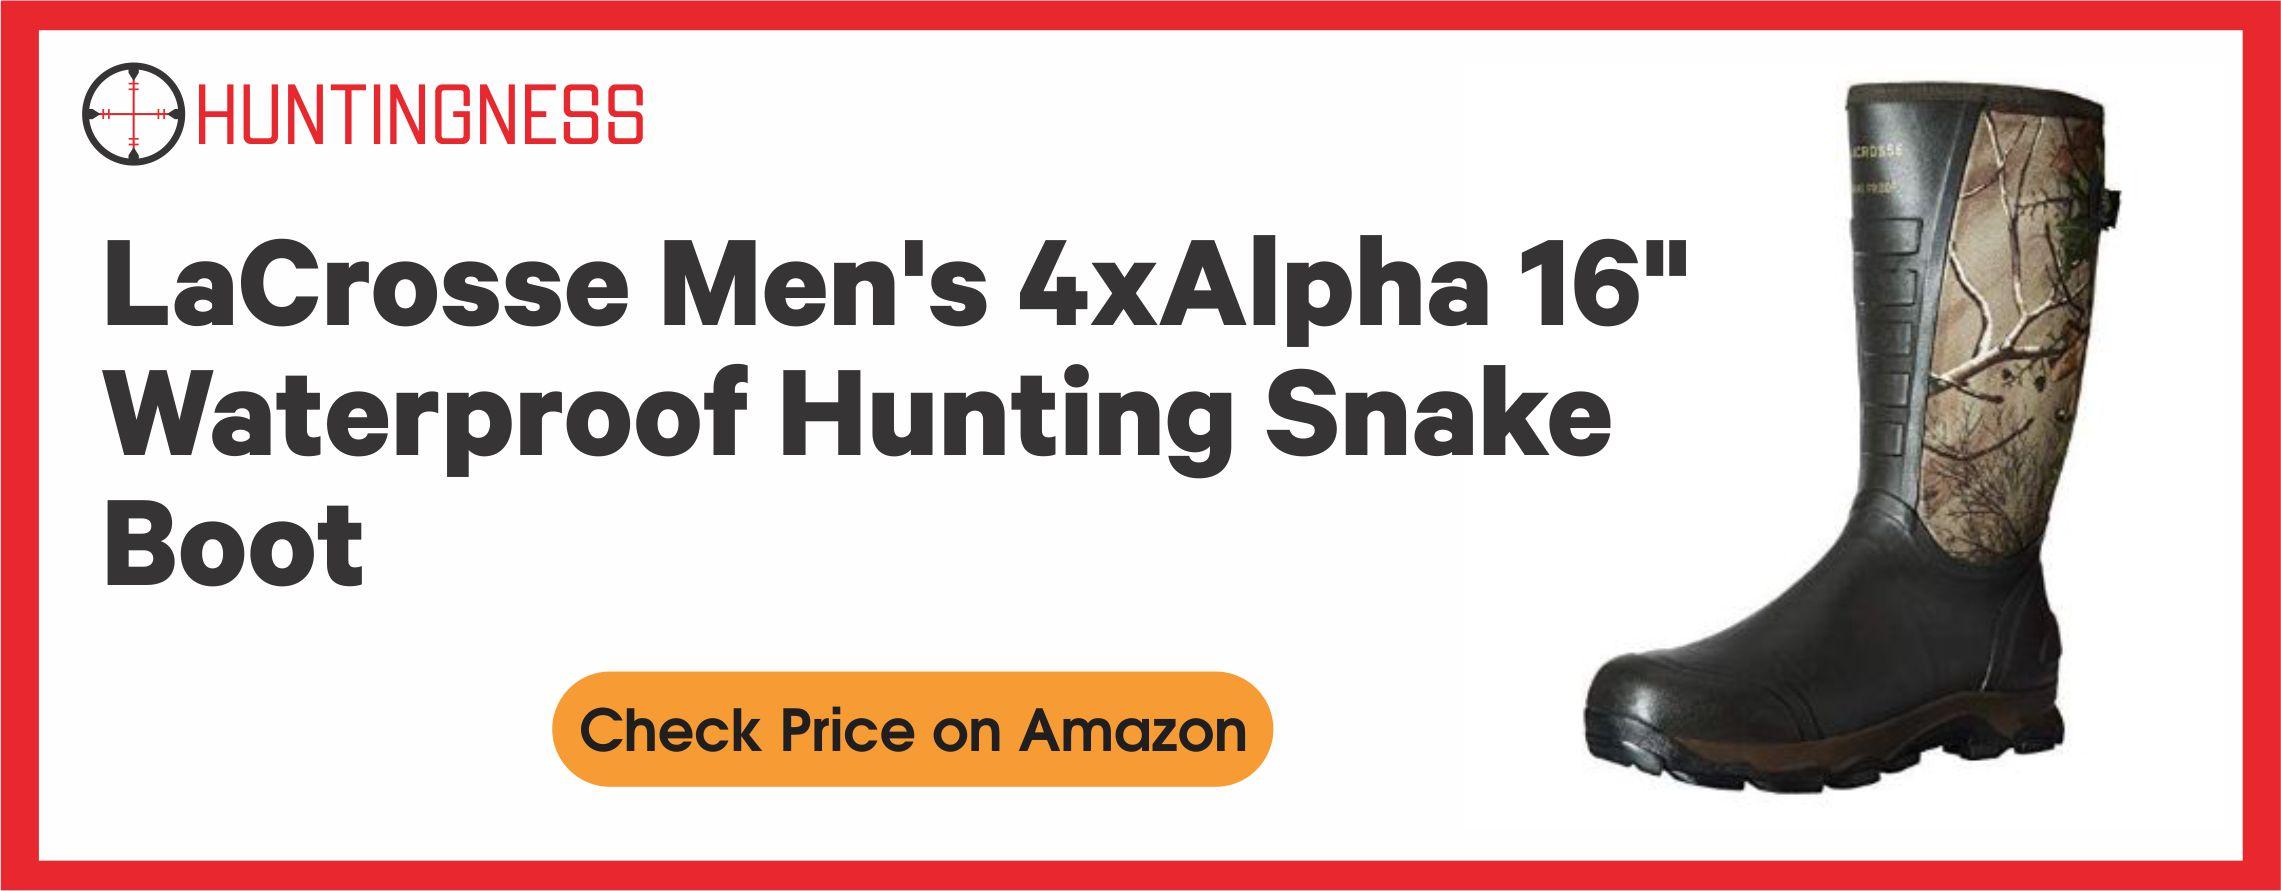 "LaCrosse Men's 4xAlpha 16"" Waterproof Hunting Snake Boot"